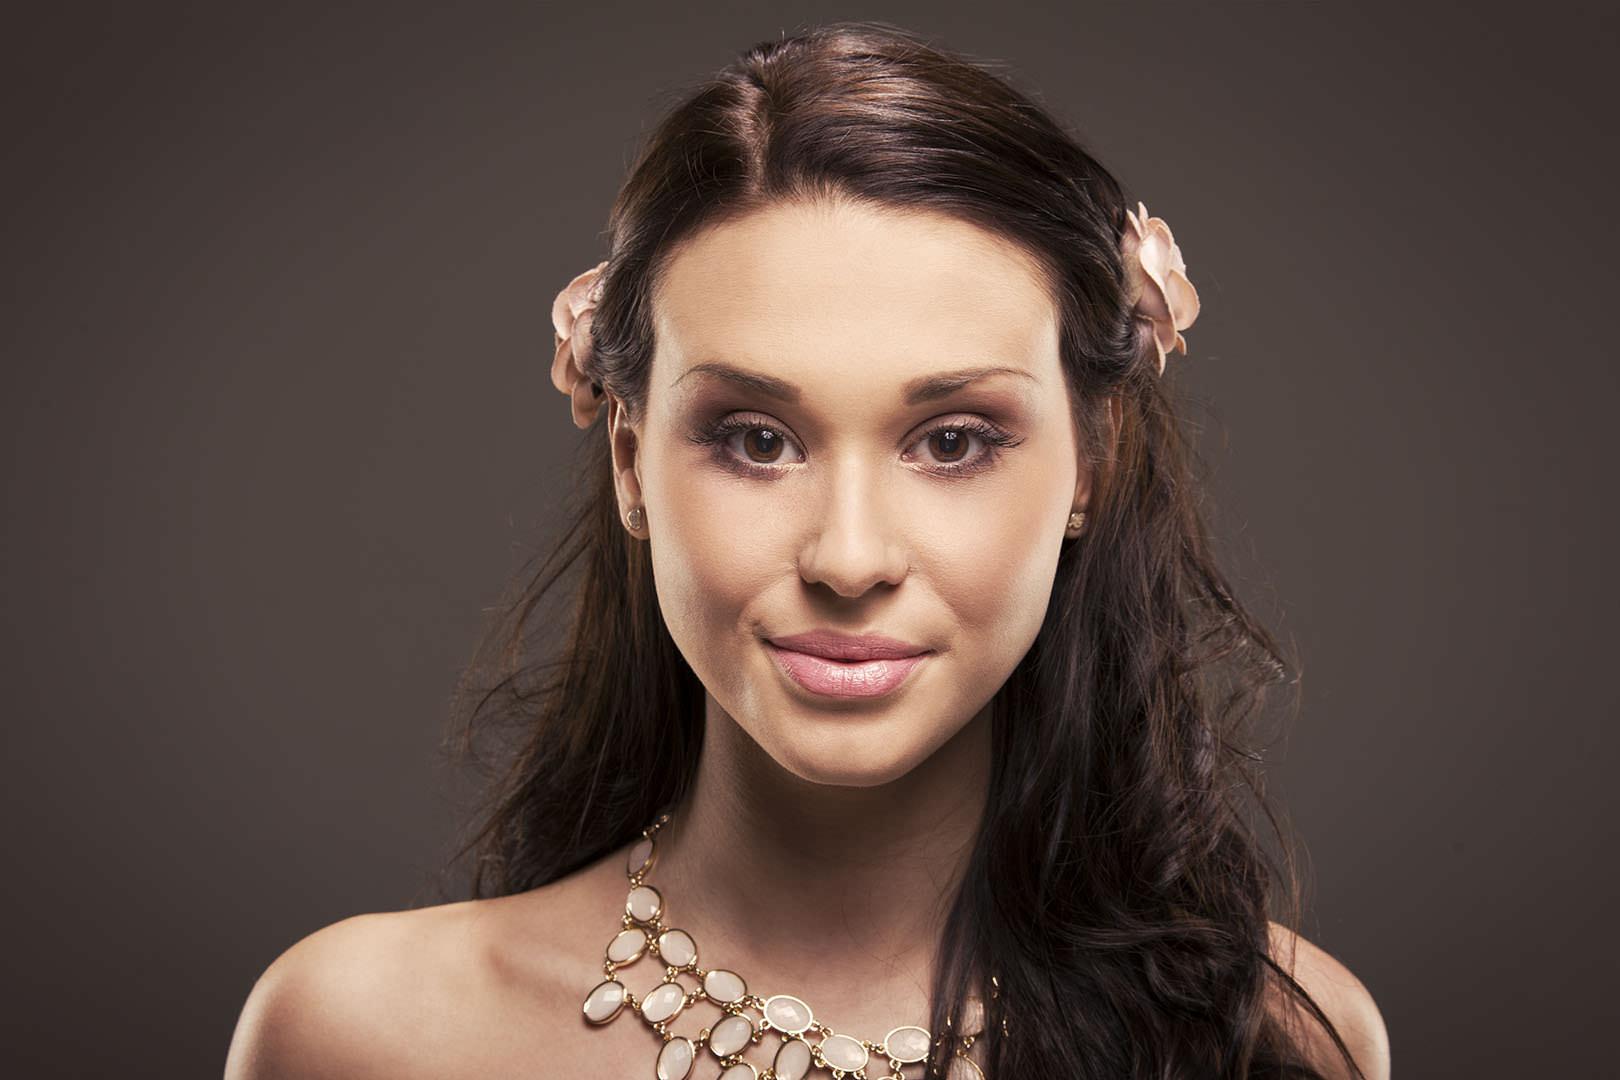 Magdalena_Dziadkowiak-Stefaniak_make_up_13